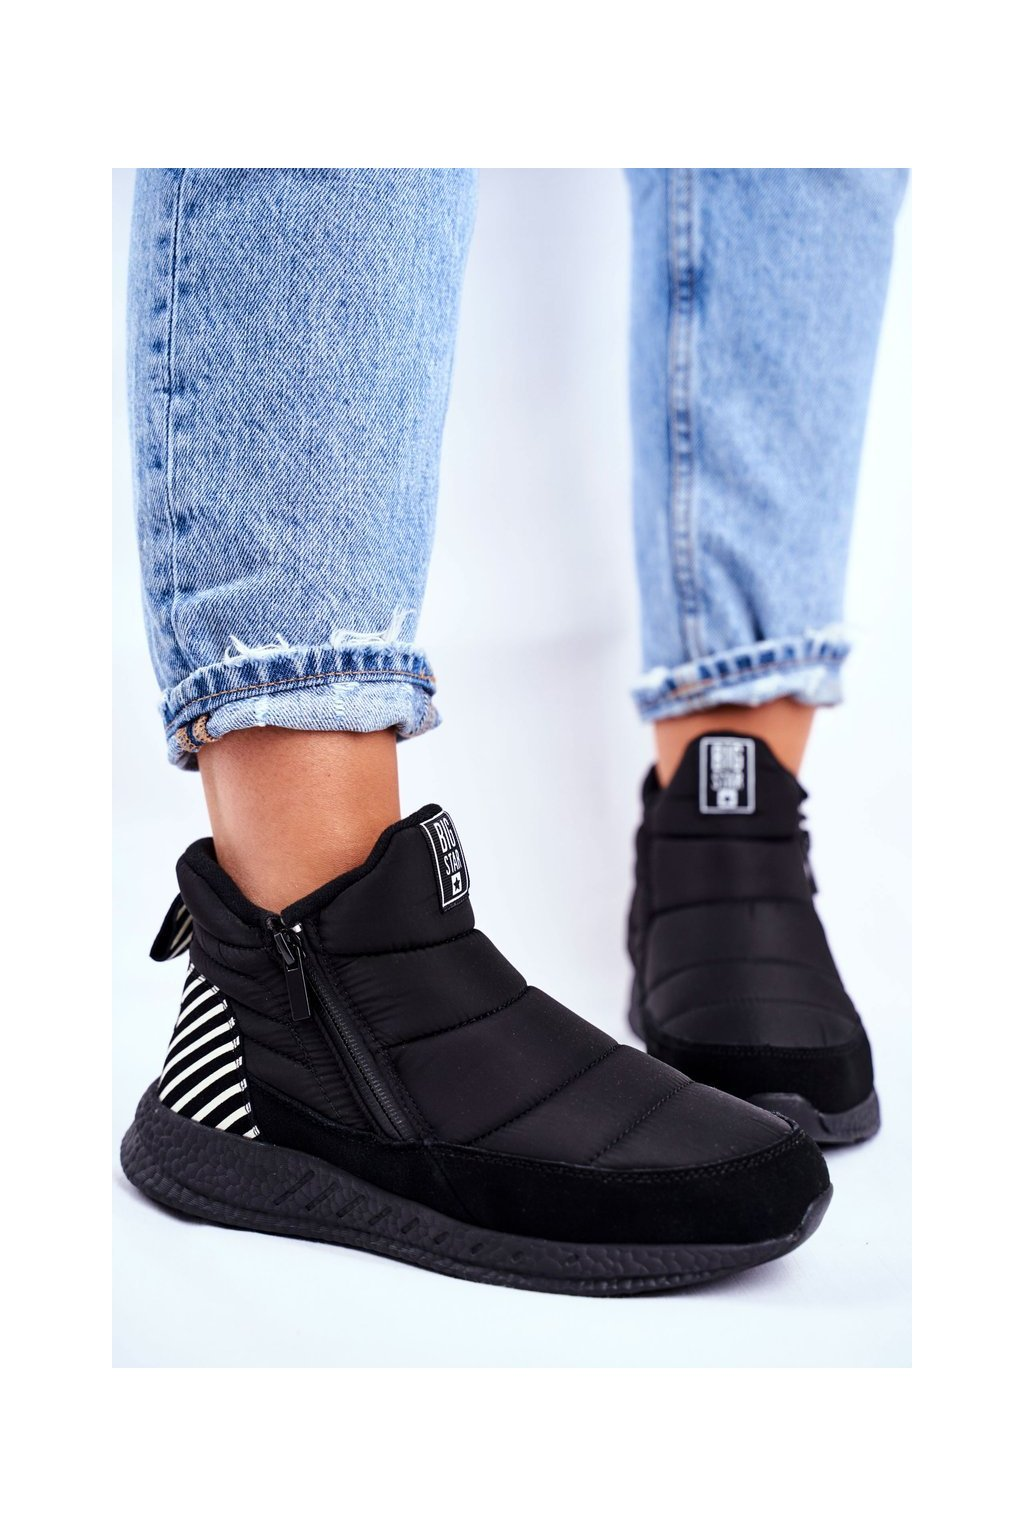 Dámske snehule farba čierna kód obuvi GG274470 BLK